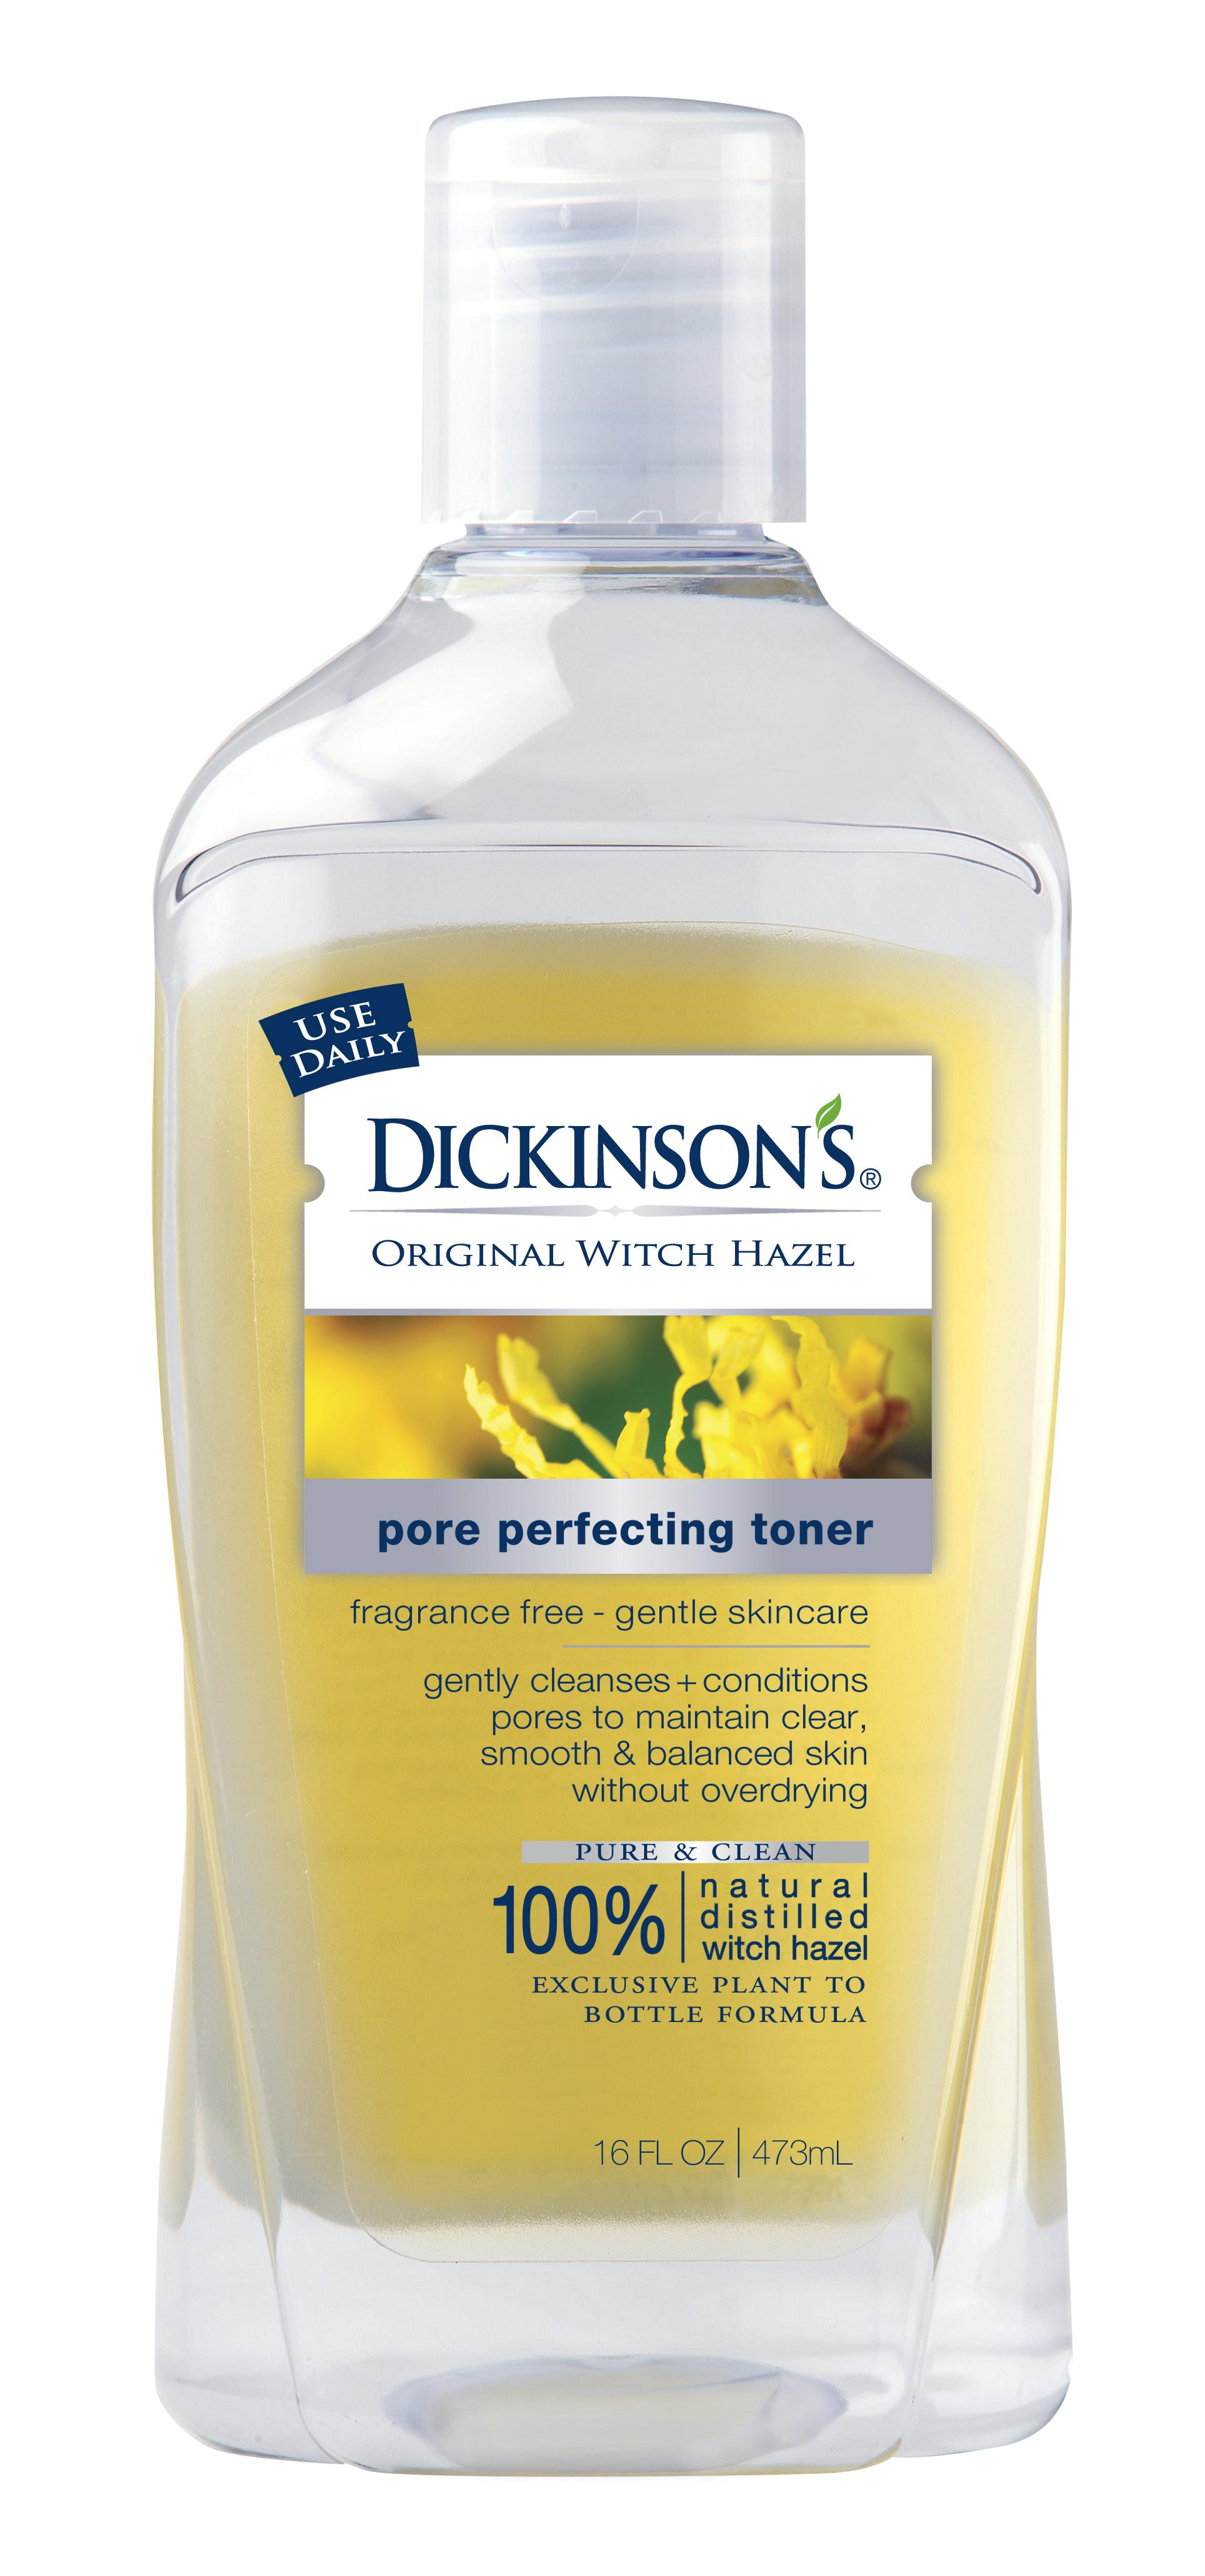 DICKINSON'S® Original Witch Hazel Pore Perfecting Toner